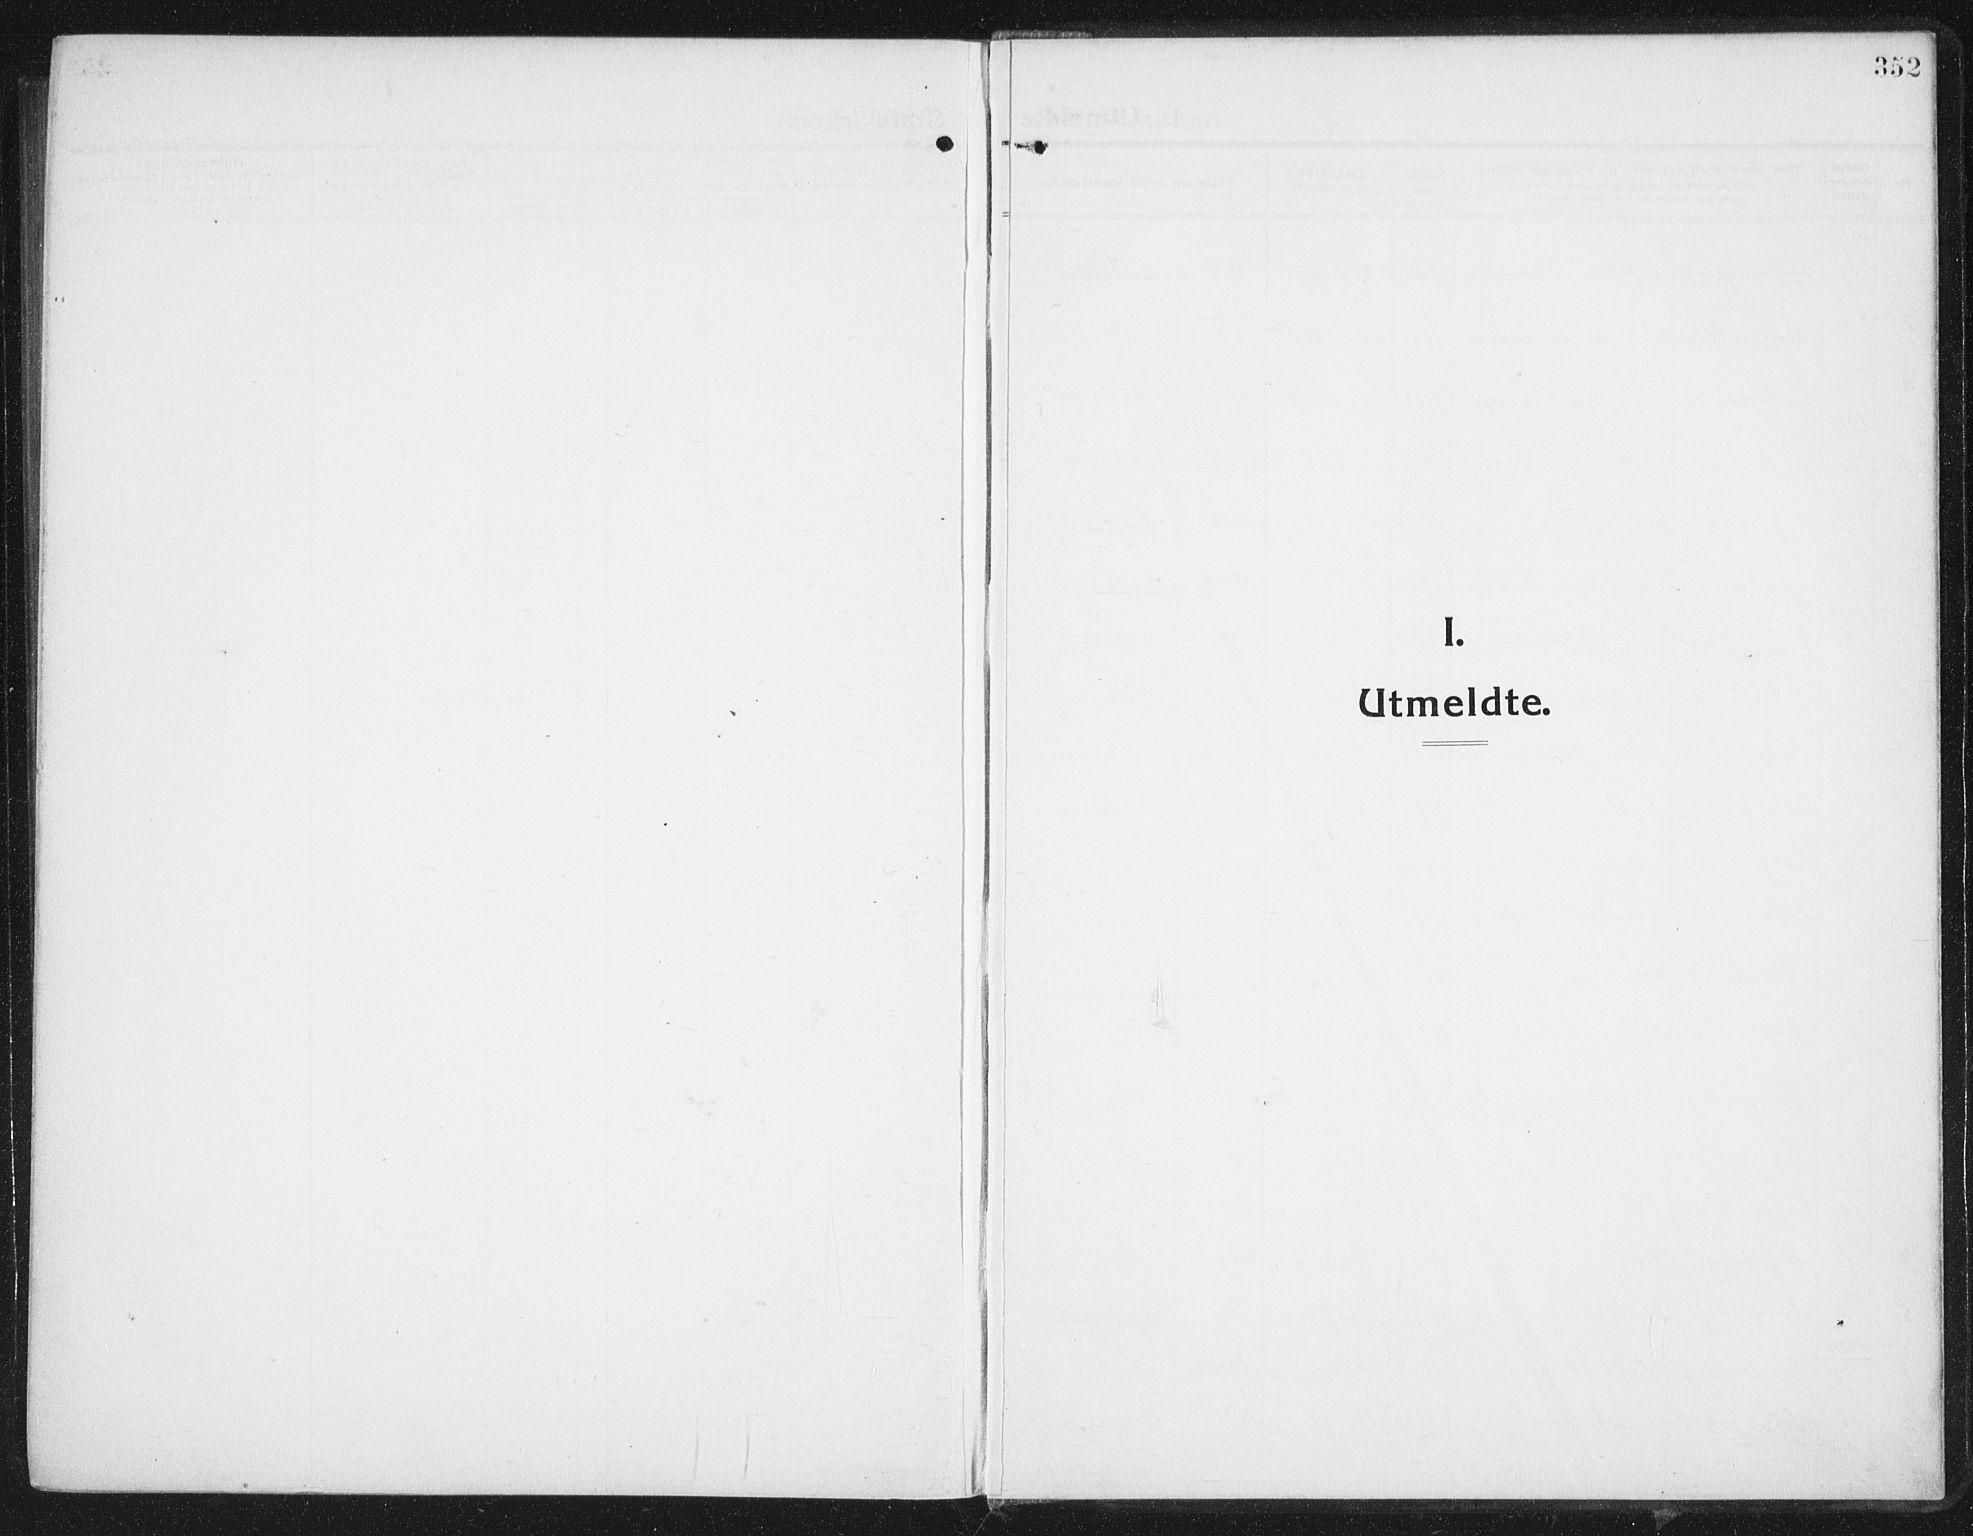 SAT, Ministerialprotokoller, klokkerbøker og fødselsregistre - Nordland, 882/L1183: Klokkerbok nr. 882C01, 1911-1938, s. 352